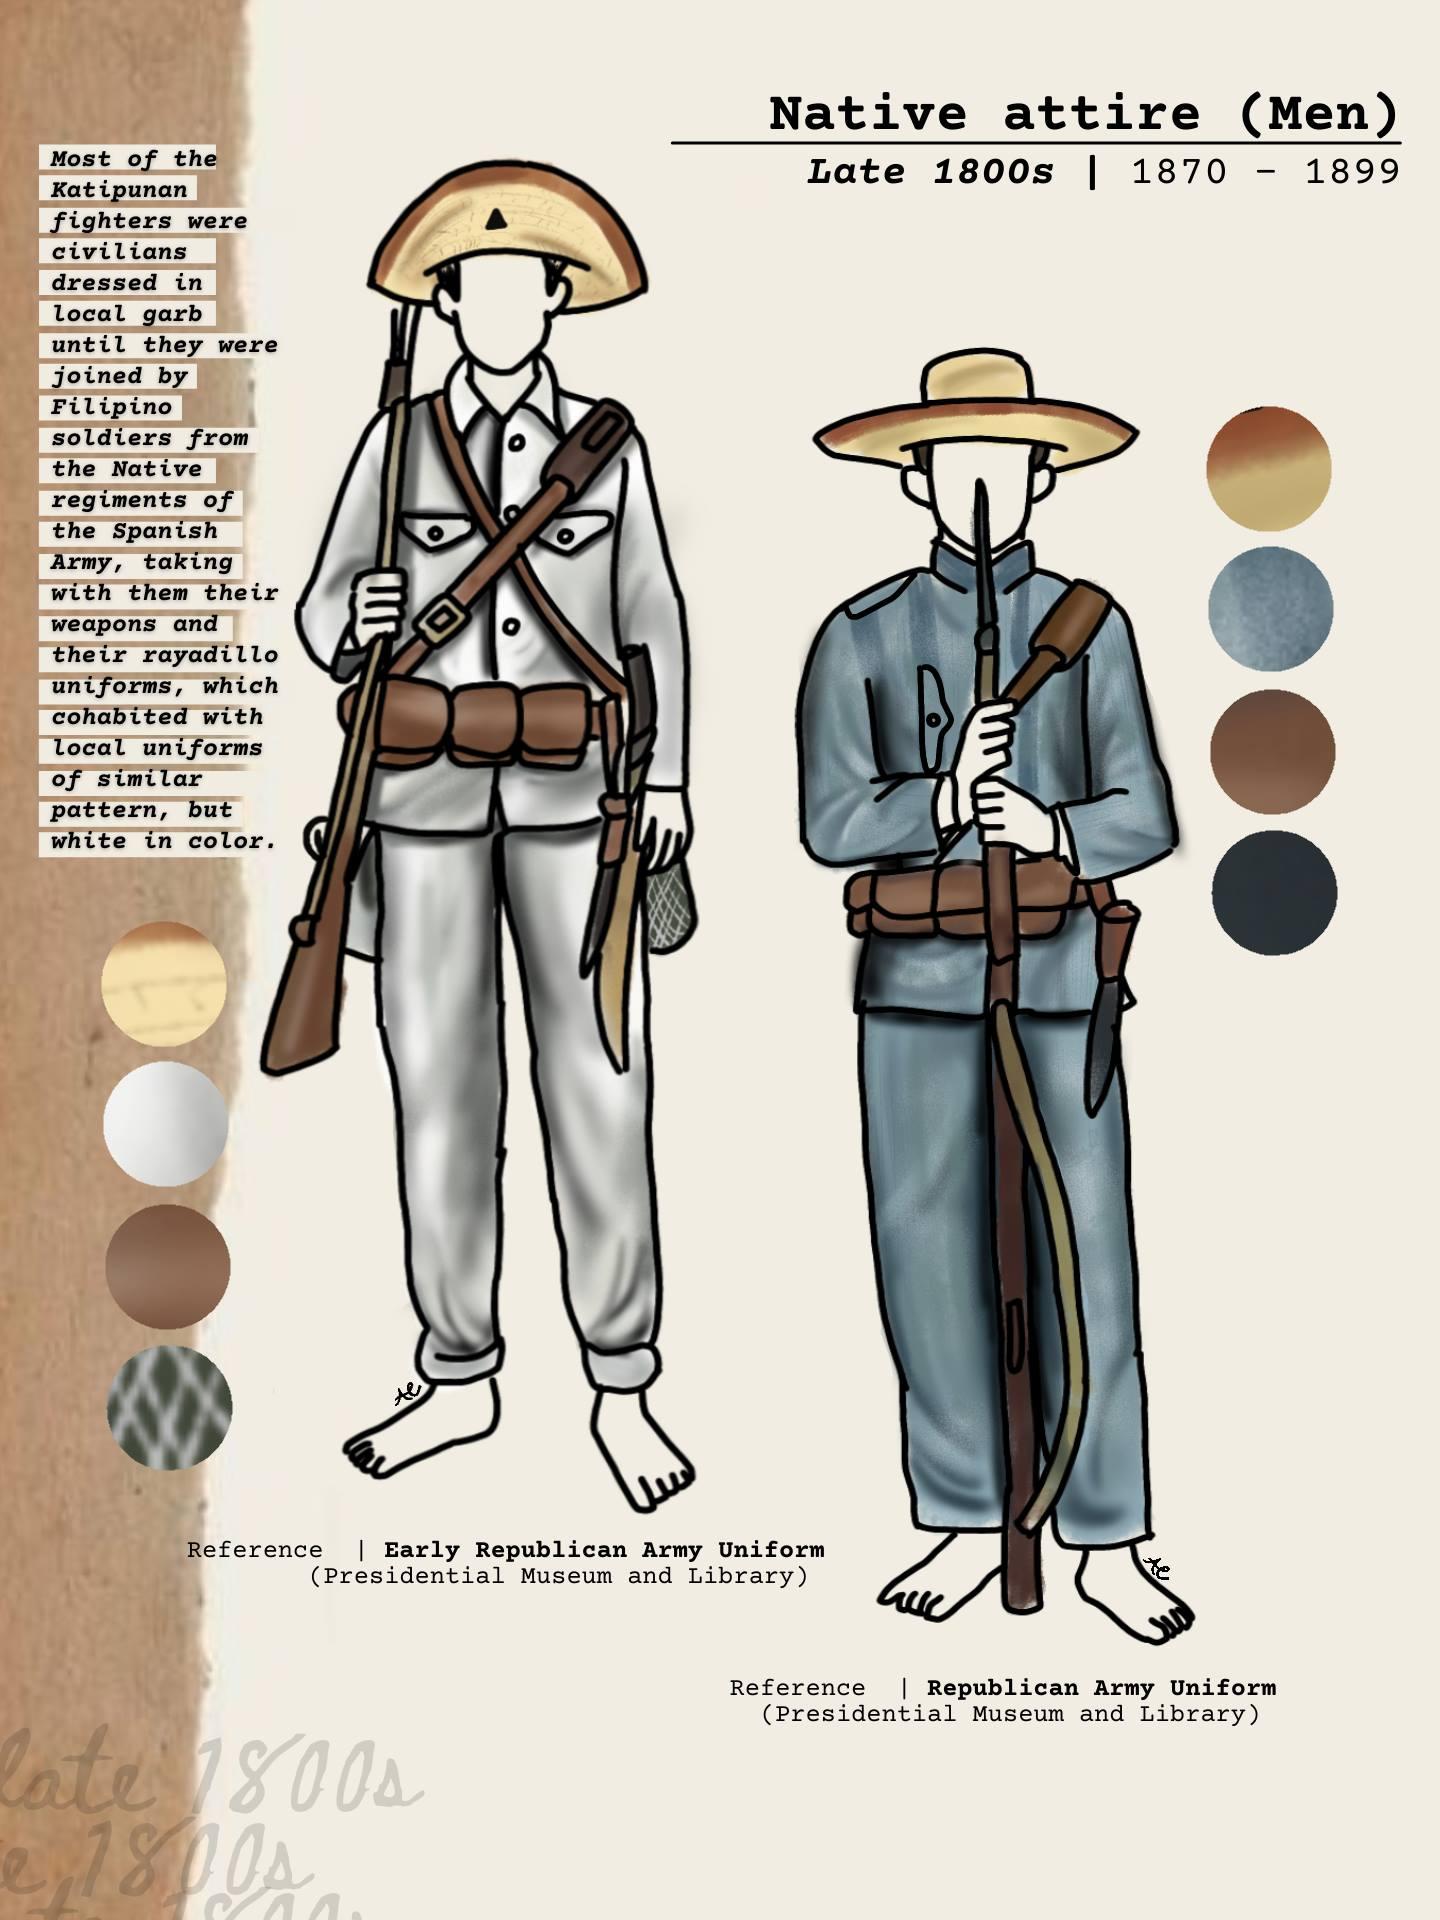 Revolutionary Uniforms, late 1800s